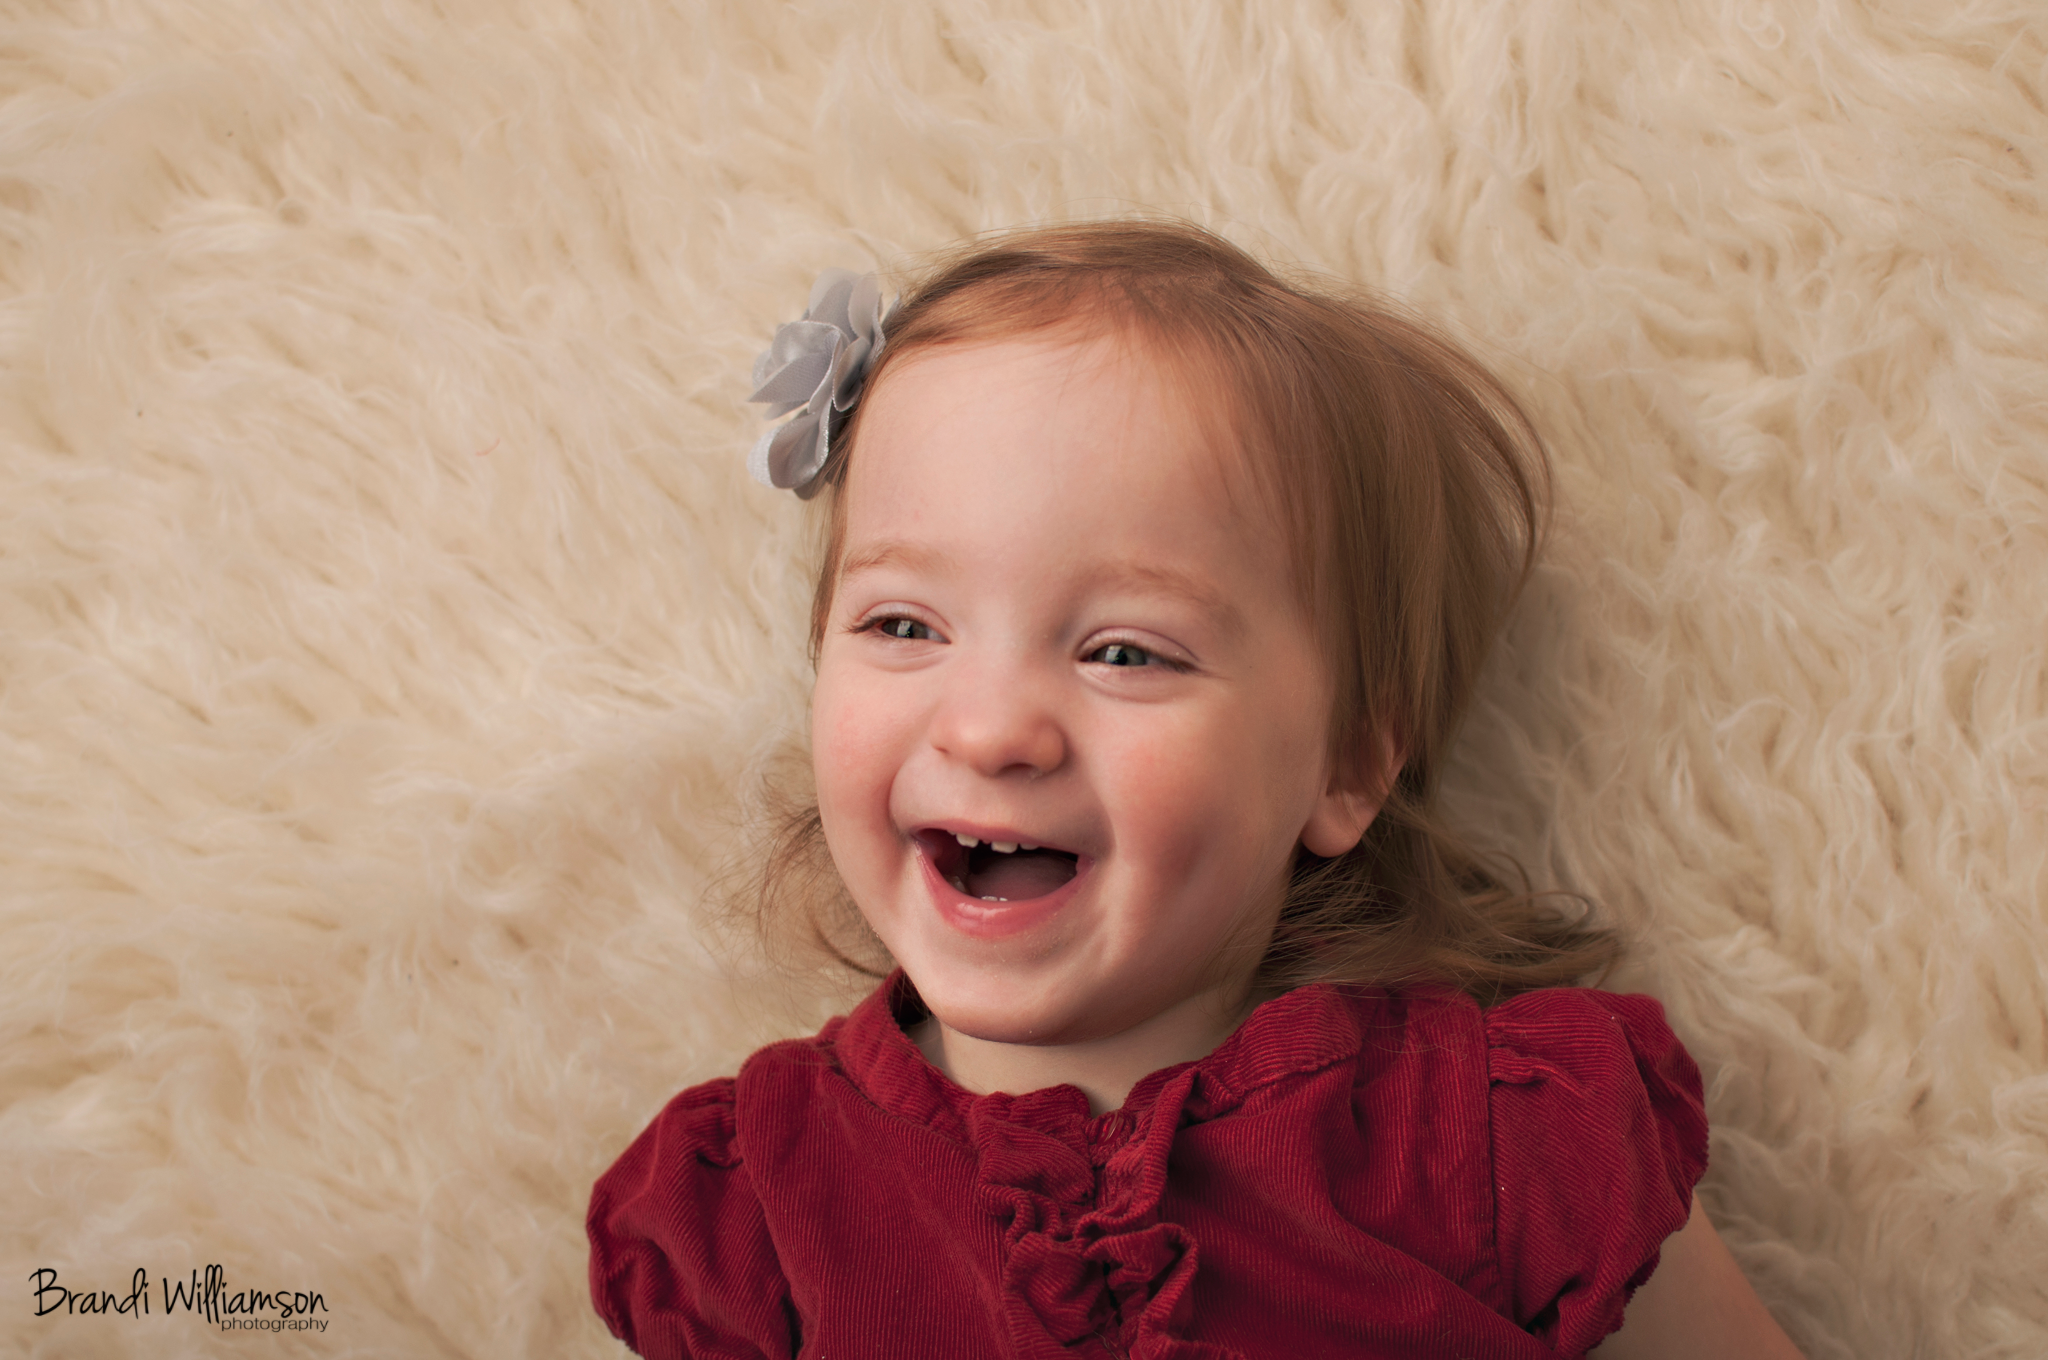 © Brandi Williamson Photography | 18 months old